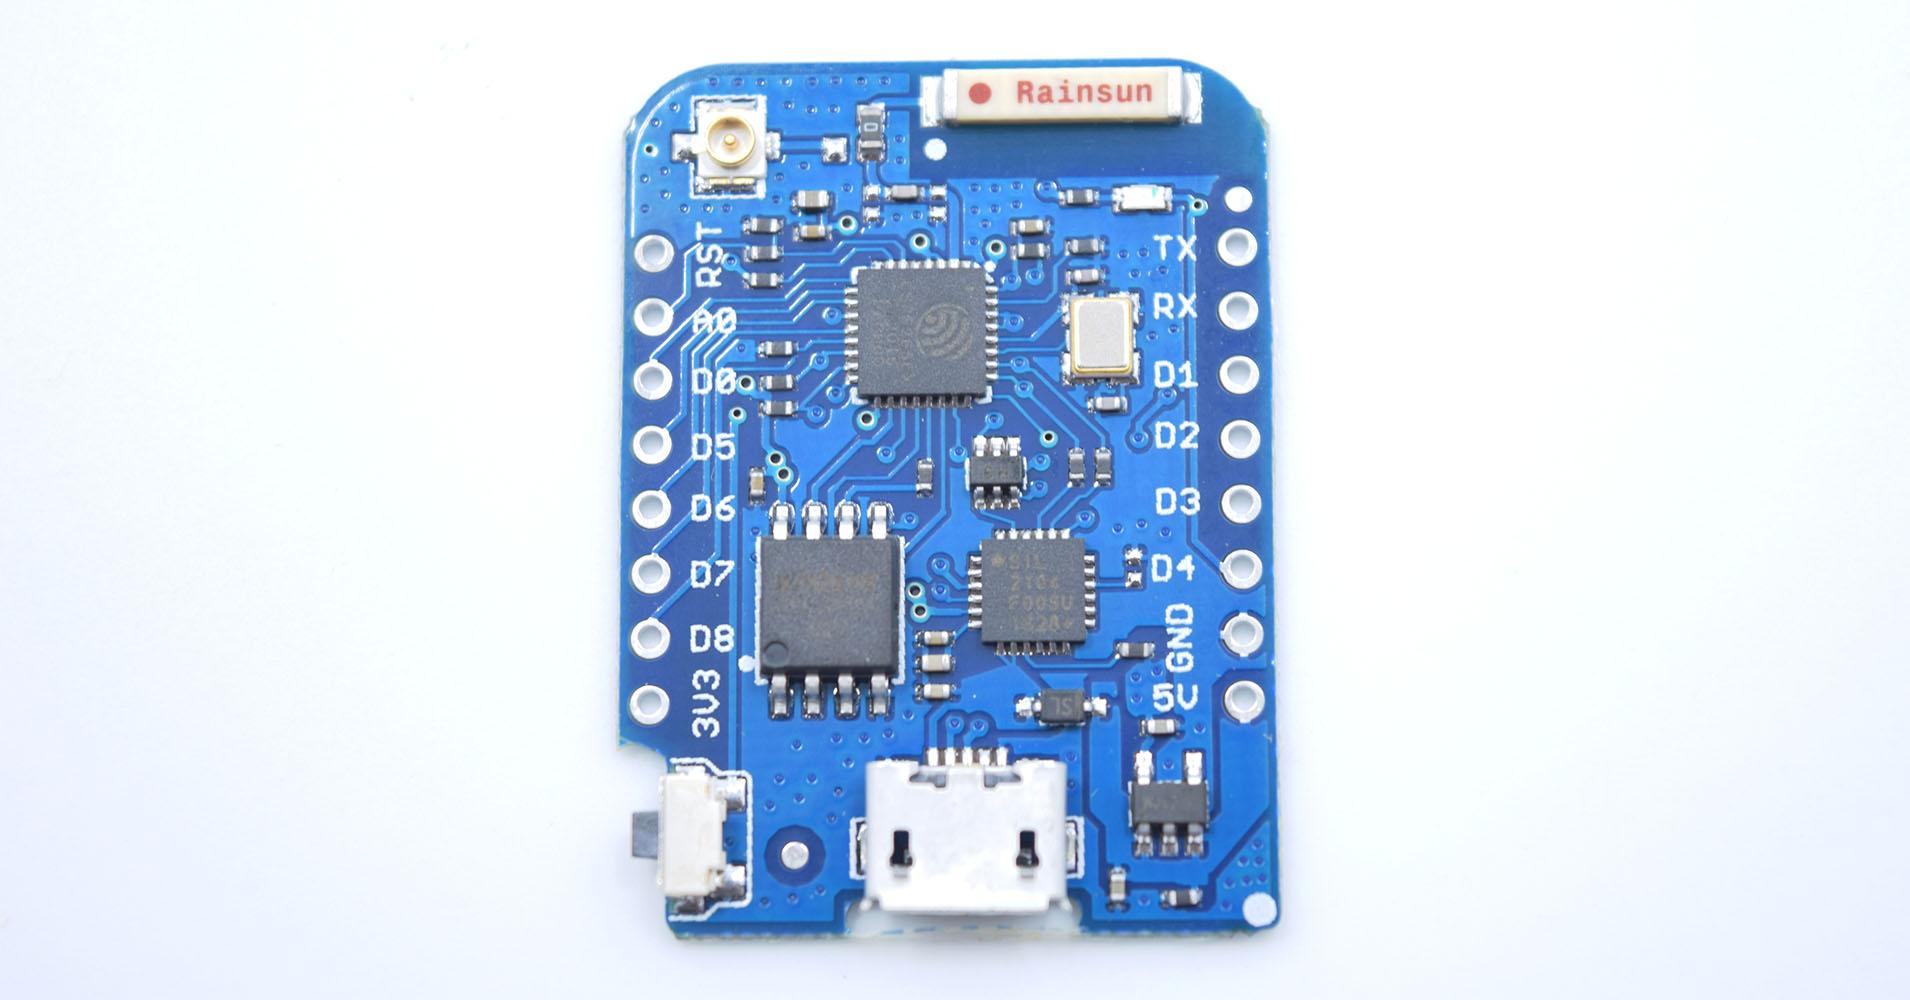 WeMos D1 mini Pro